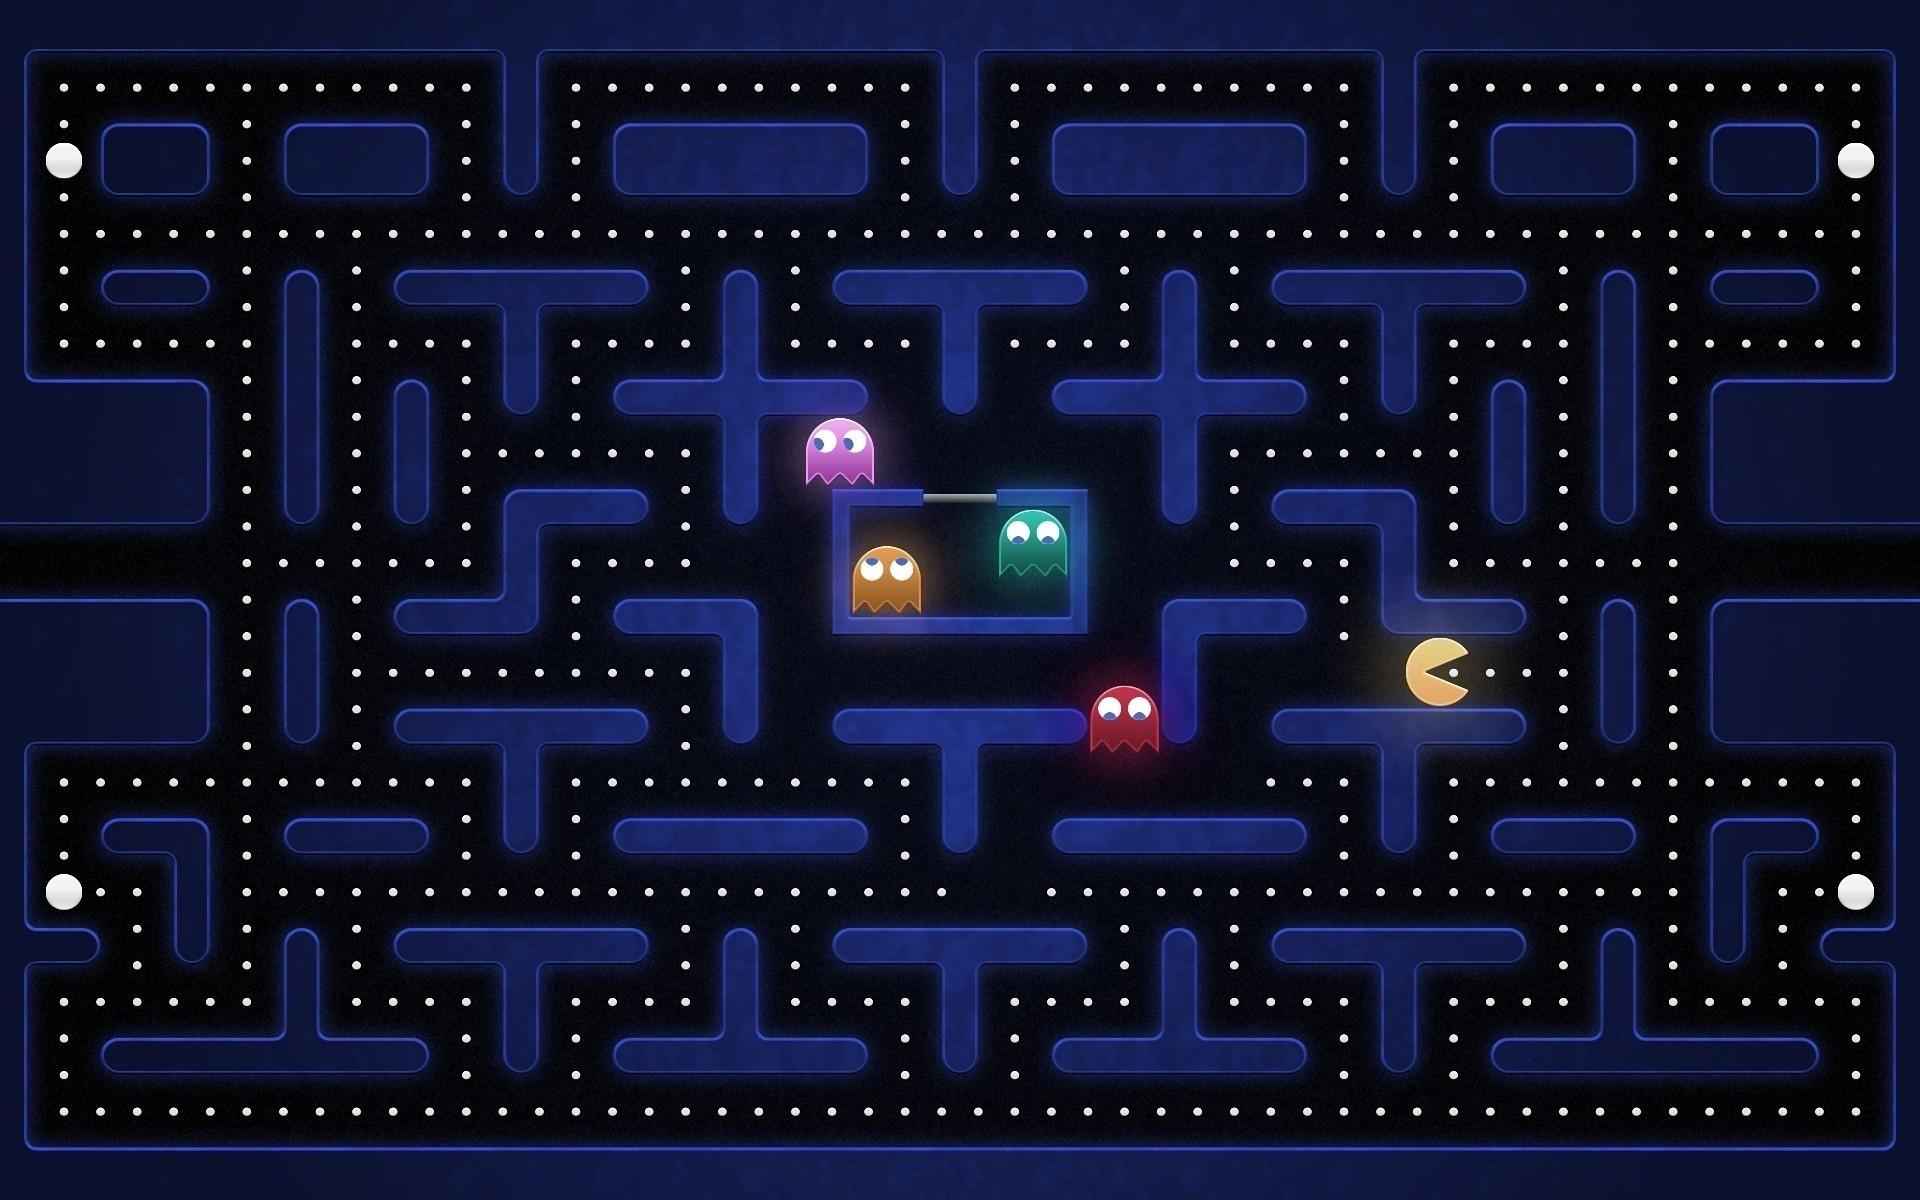 Pacman Wallpapers – Pacman desktop wallpapers – 124 and wallpapers